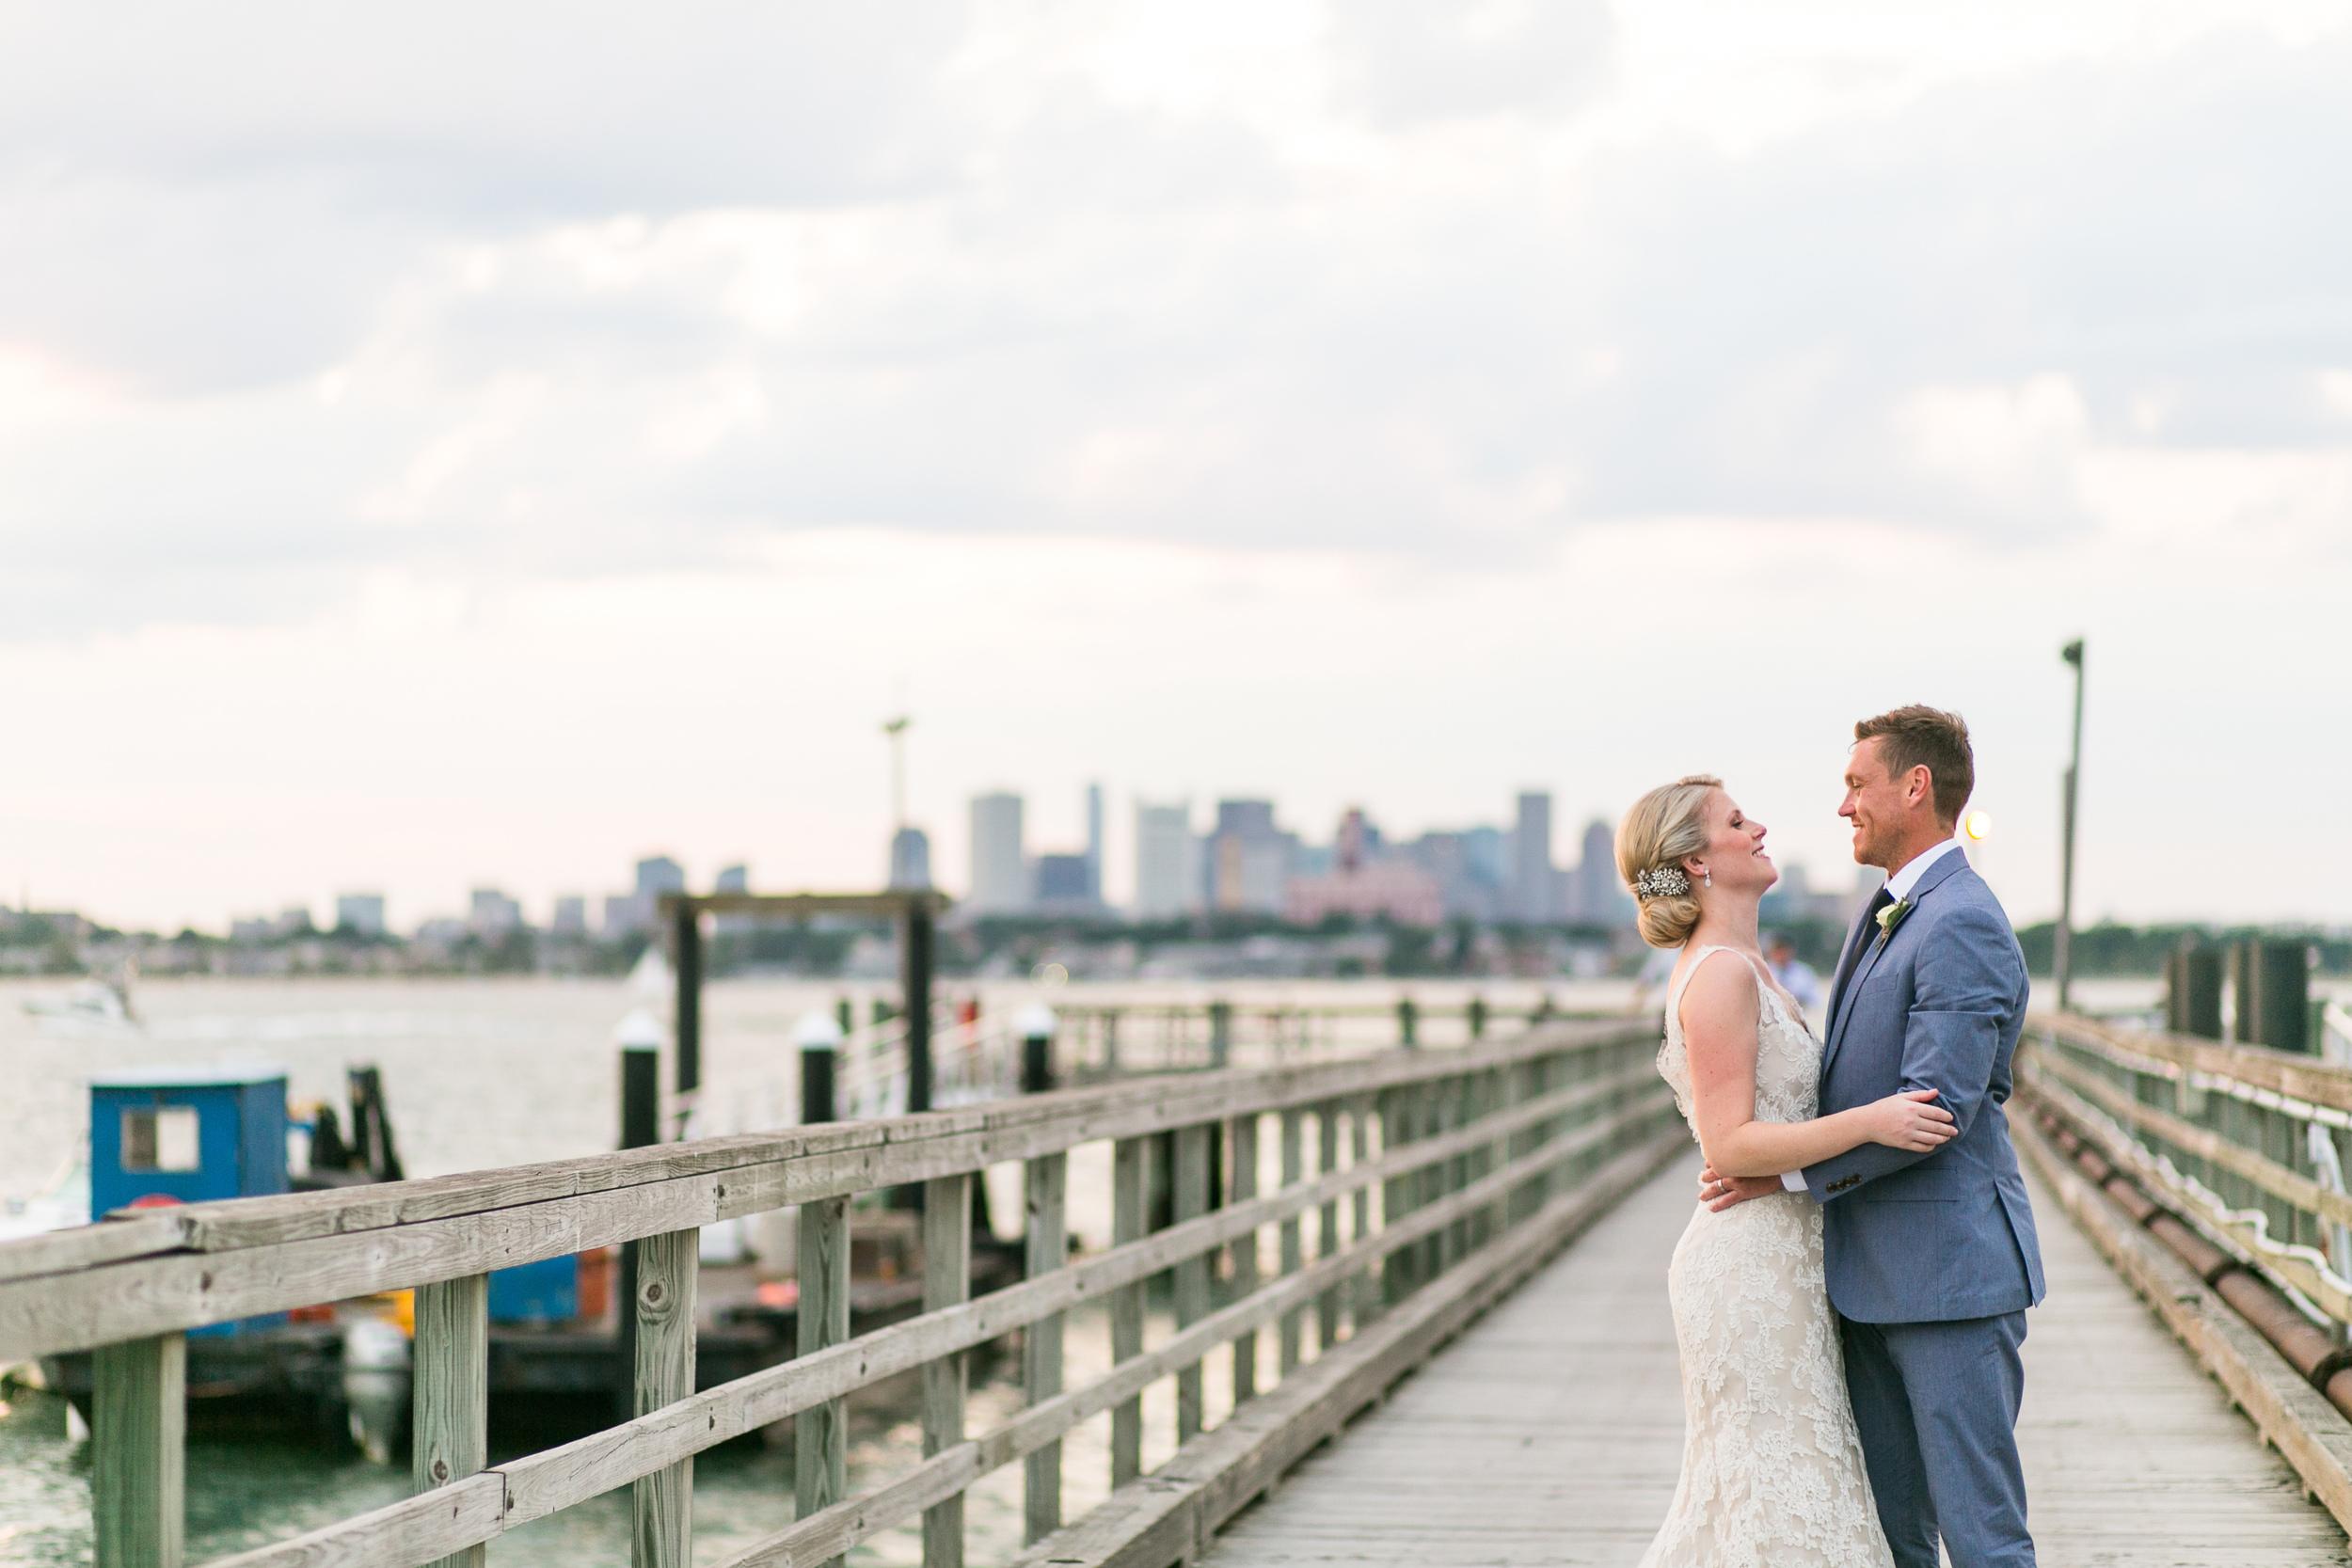 thompson-island-boston-harbor-wedding